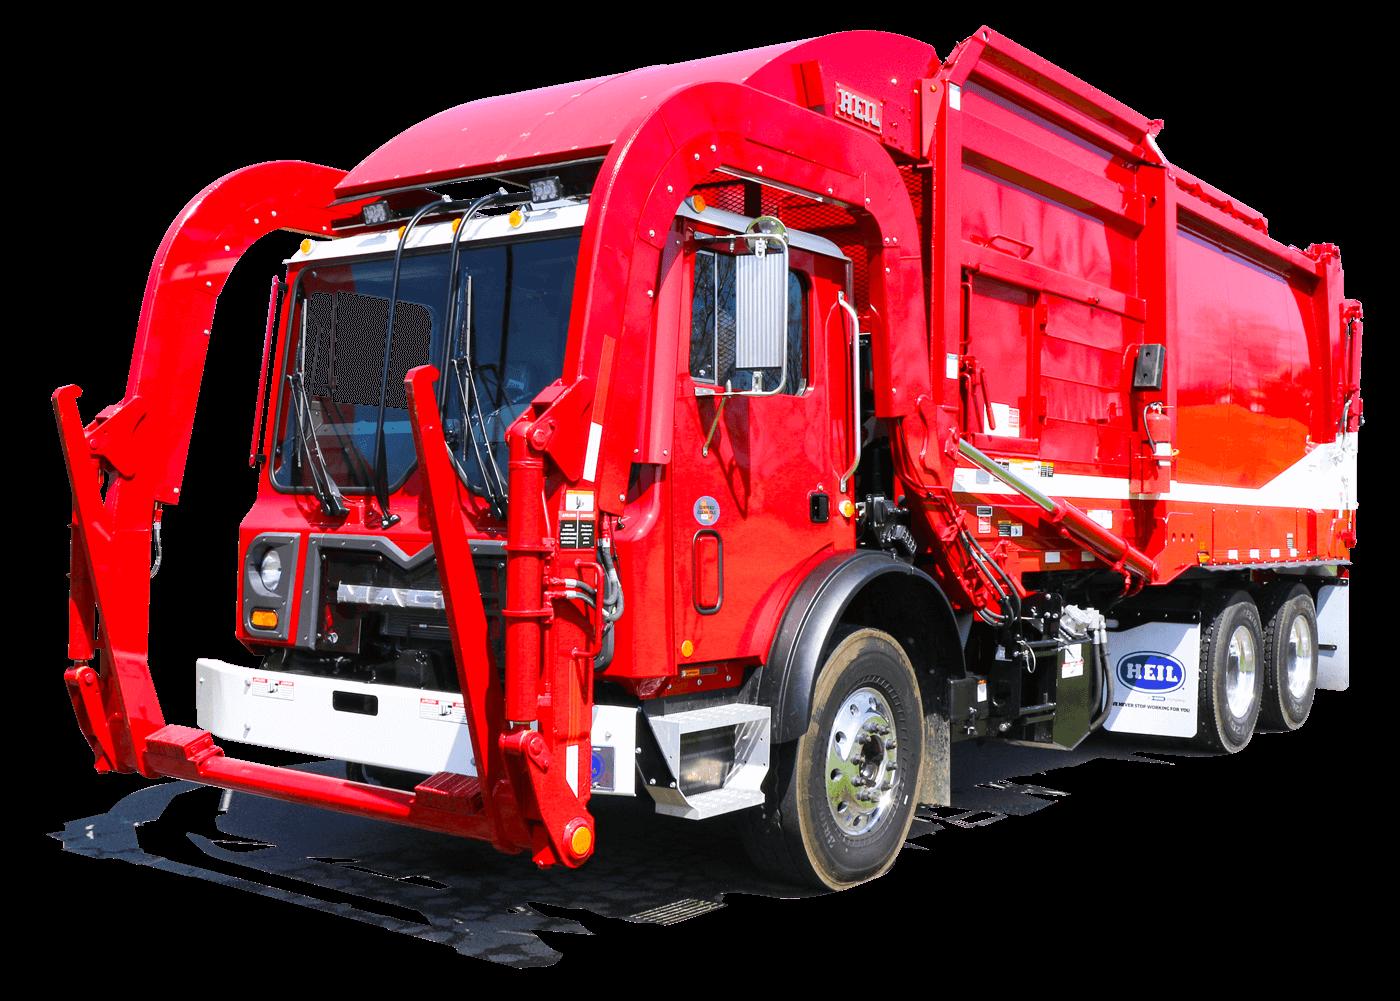 Sierra Commercial Frontload Trash Truck